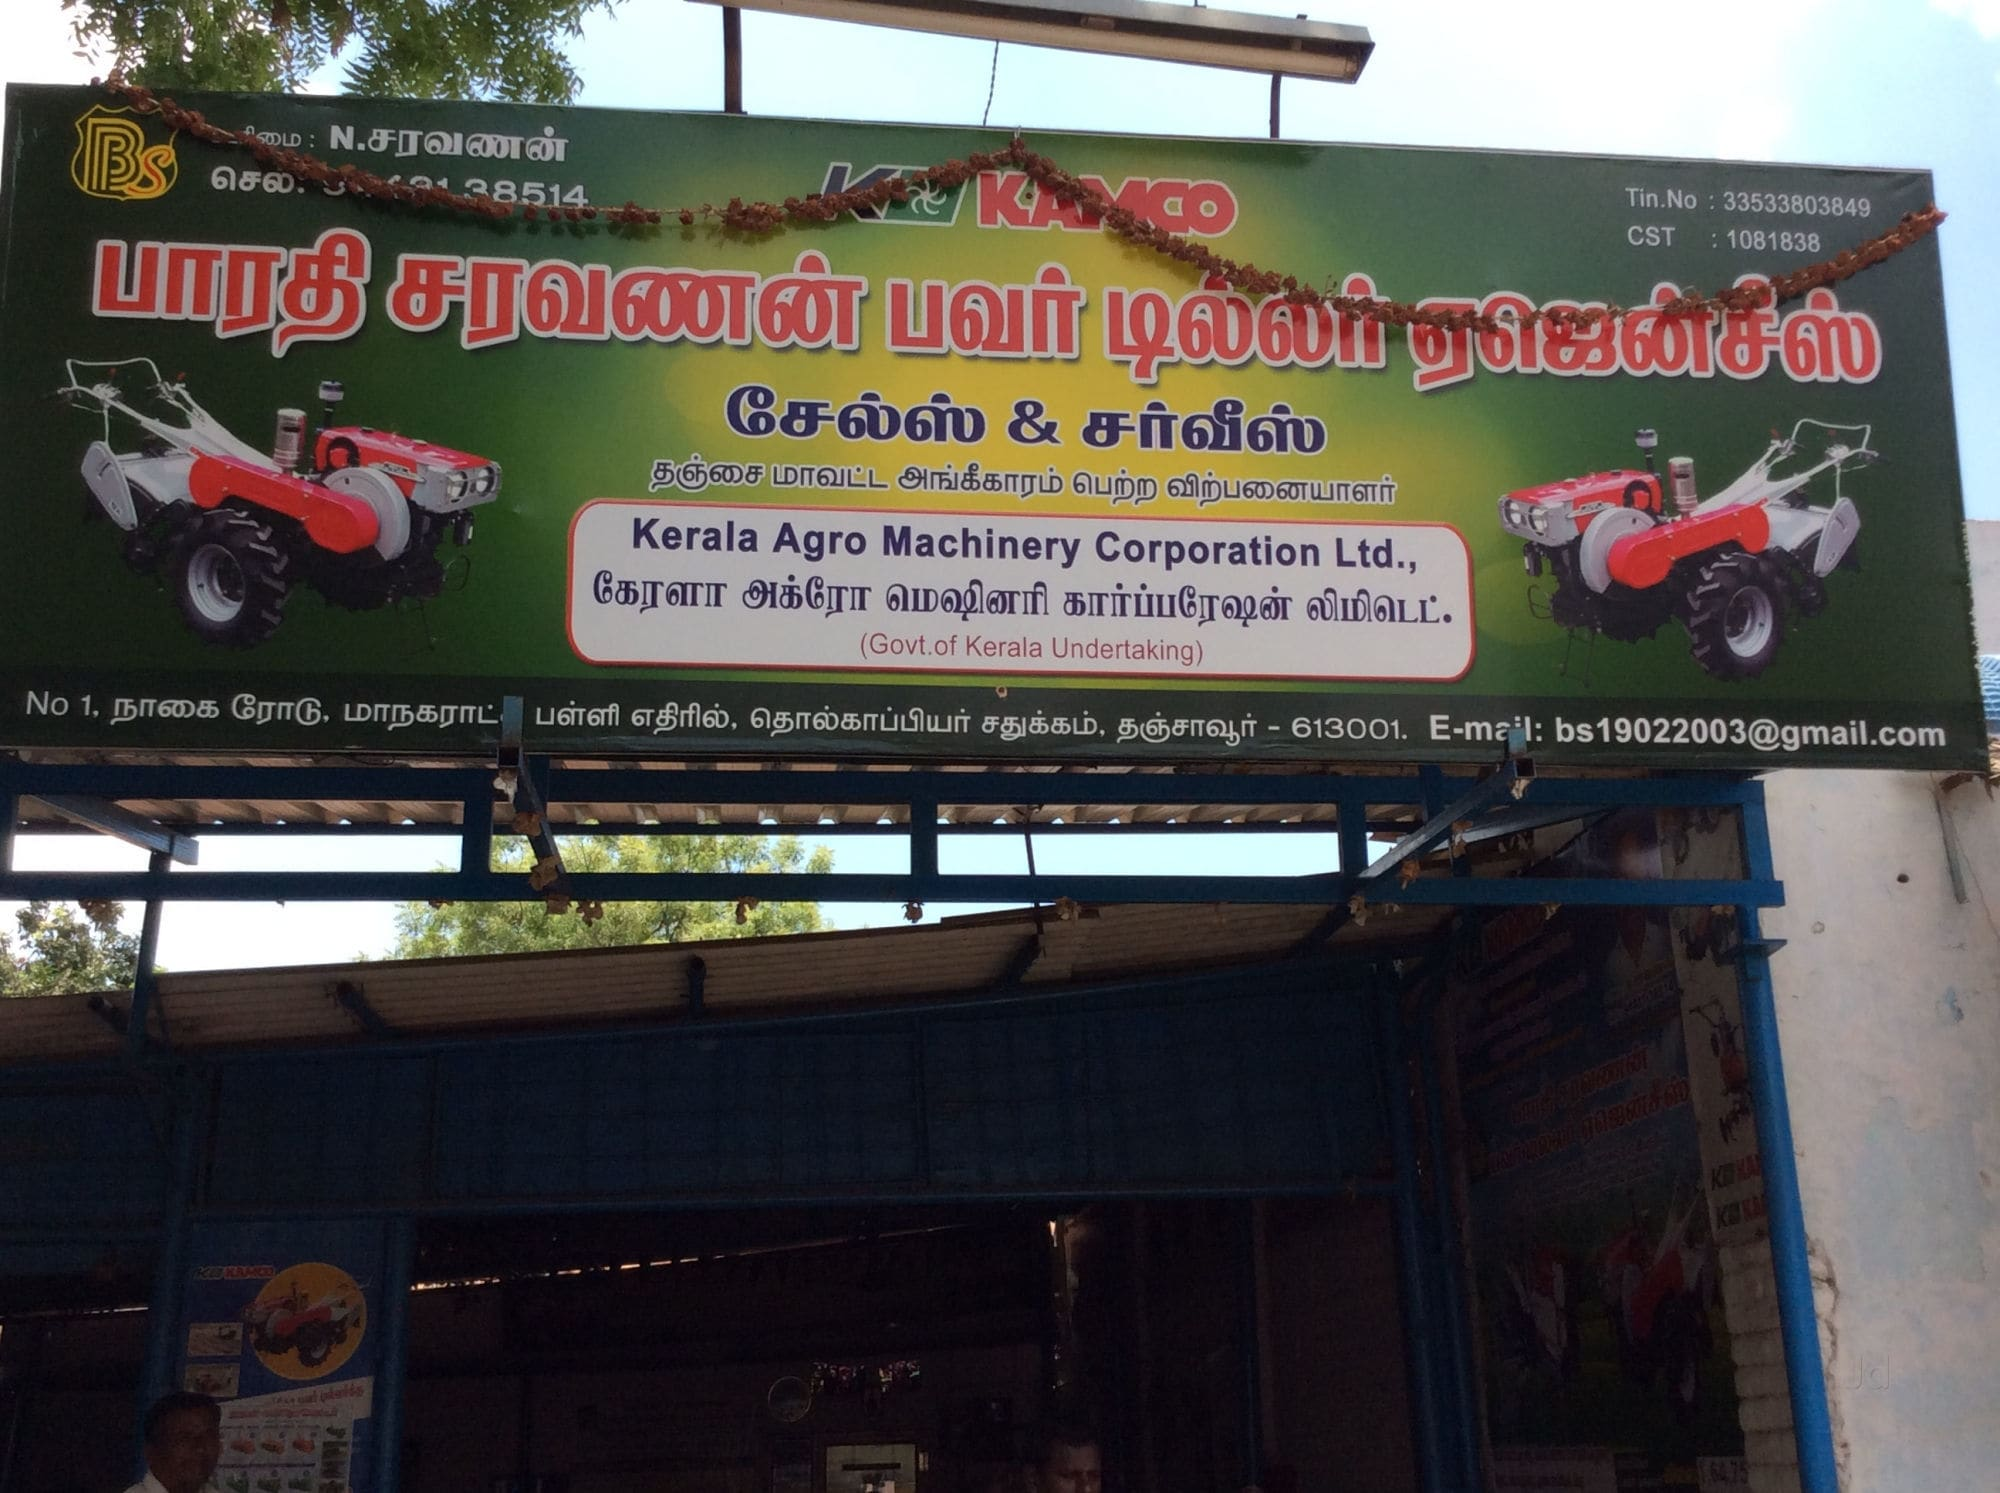 Top Kamco Power Tiller Dealers in Thanjavur - Best Kamco